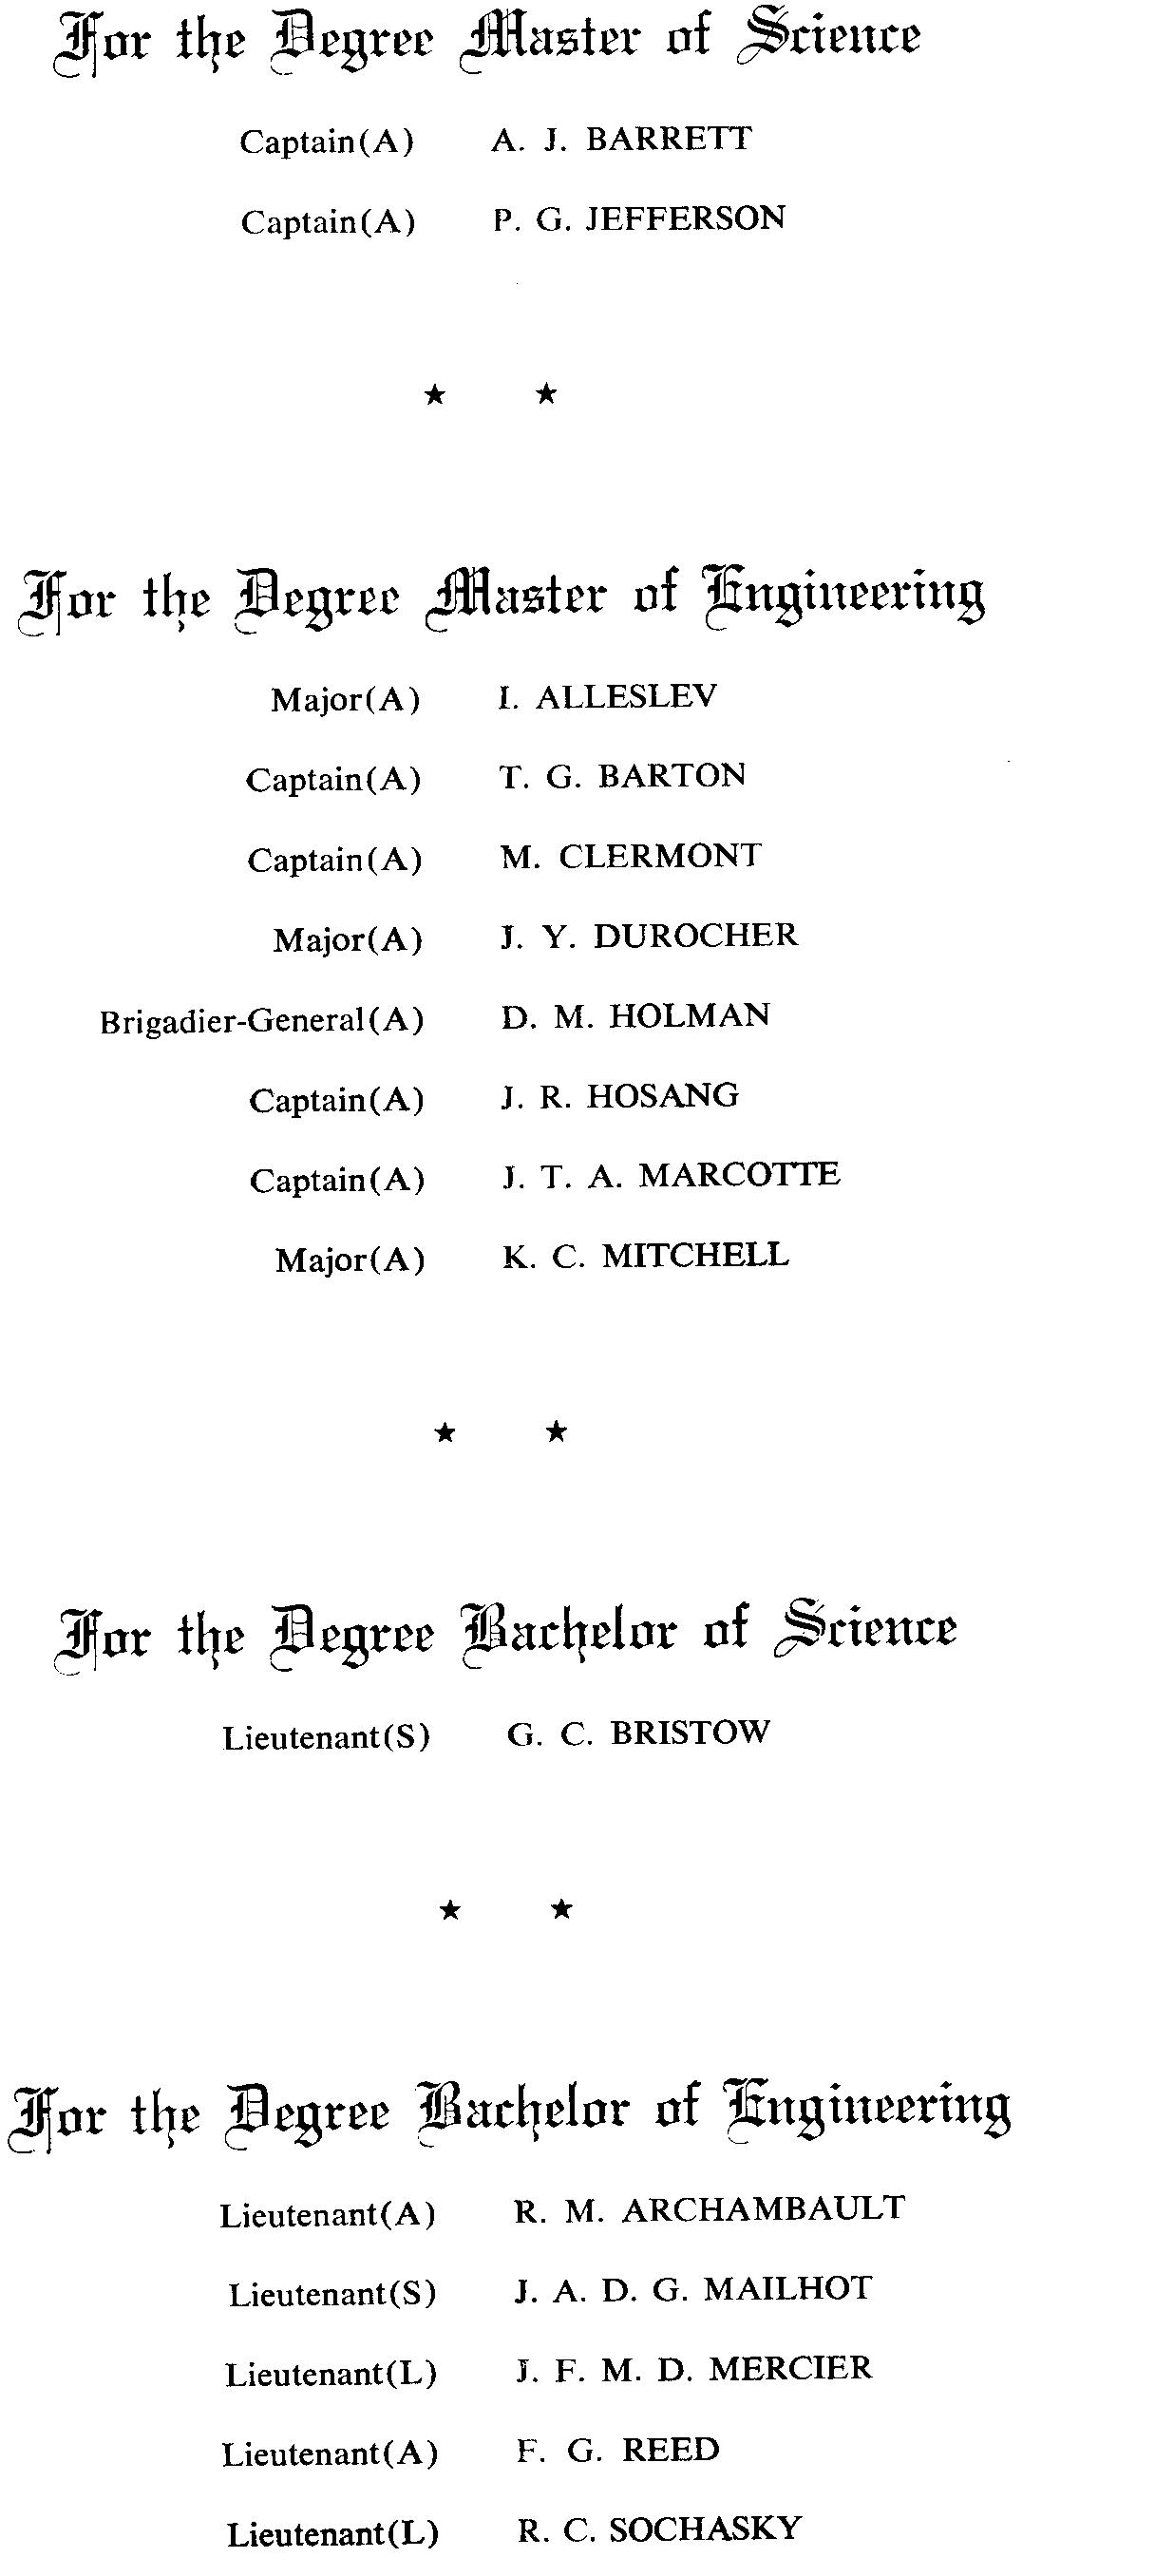 6_RMC-Graduation Ceremonies-22 May 1971-P3